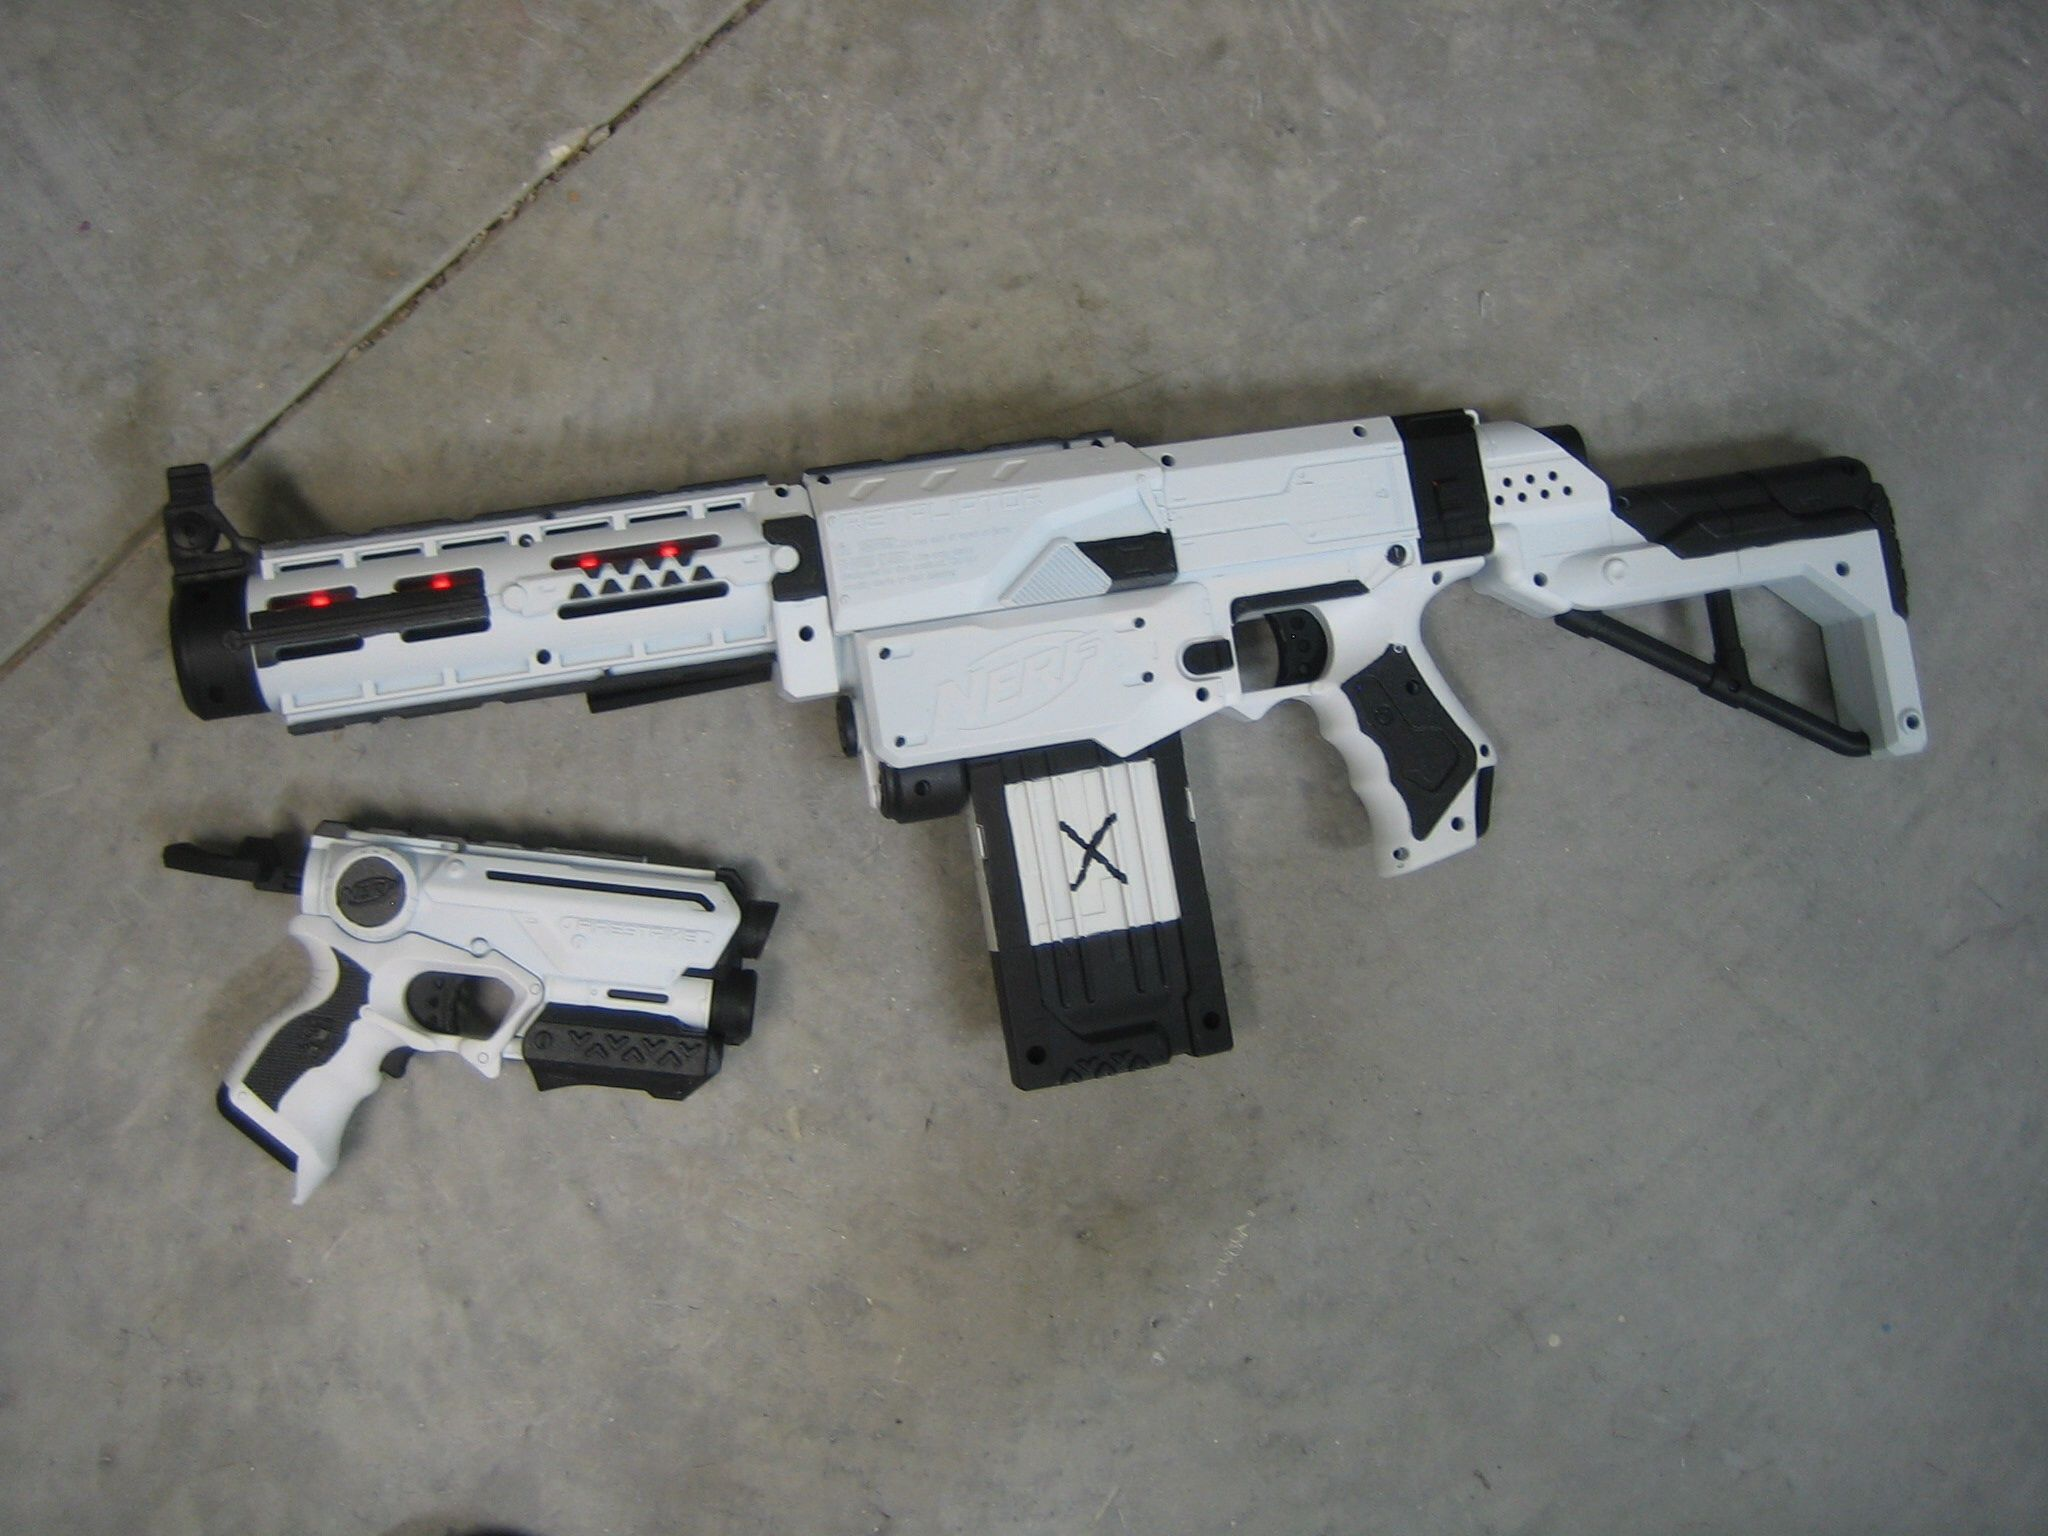 X com weapons by coop772. NerfWeaponsWeapons GunsWeaponGunsGunFirearms